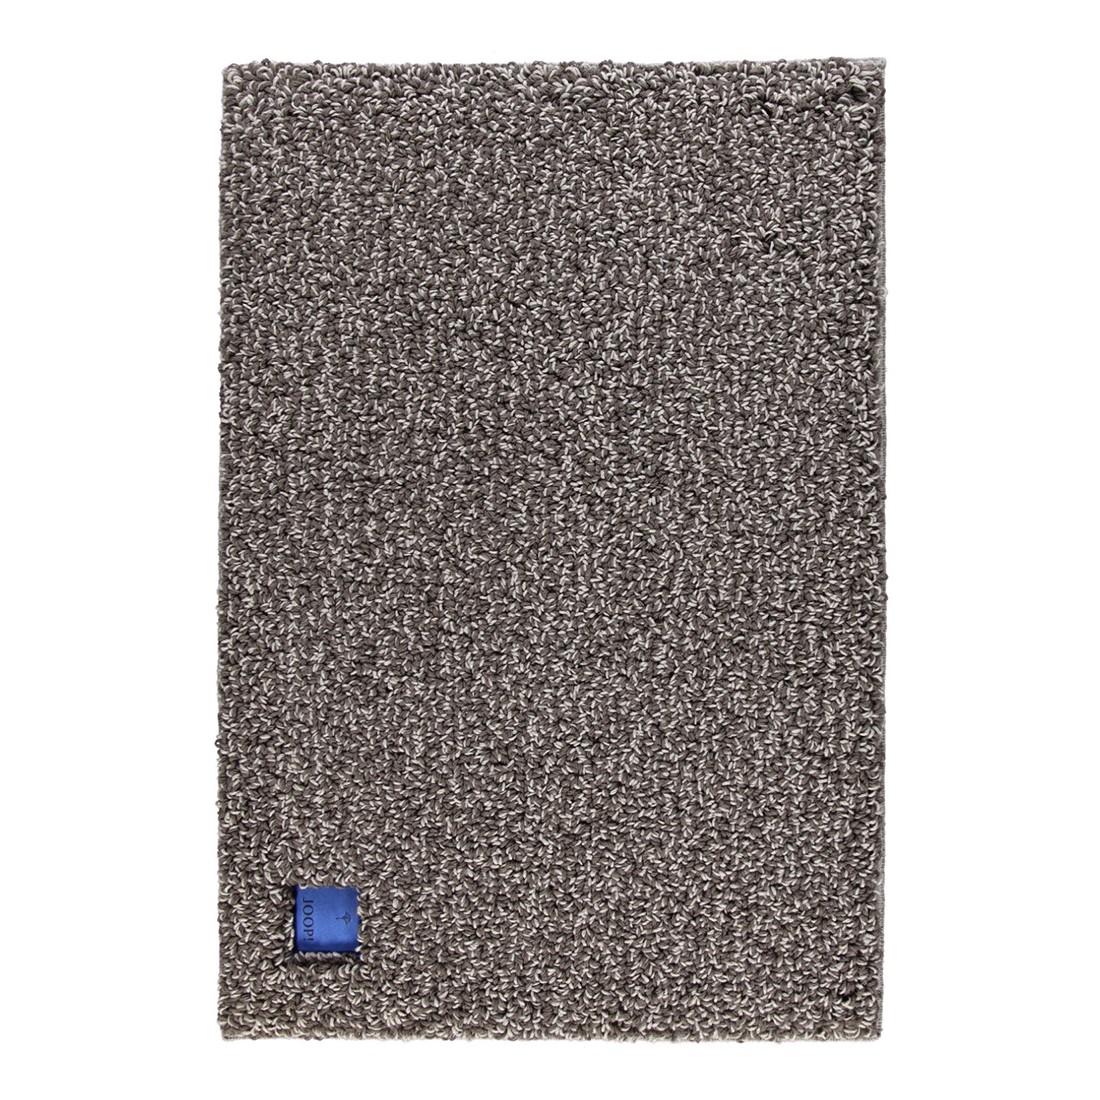 badteppich loop 100 polyacryl basalt 334 70 x 120 cm joop g nstig online kaufen. Black Bedroom Furniture Sets. Home Design Ideas